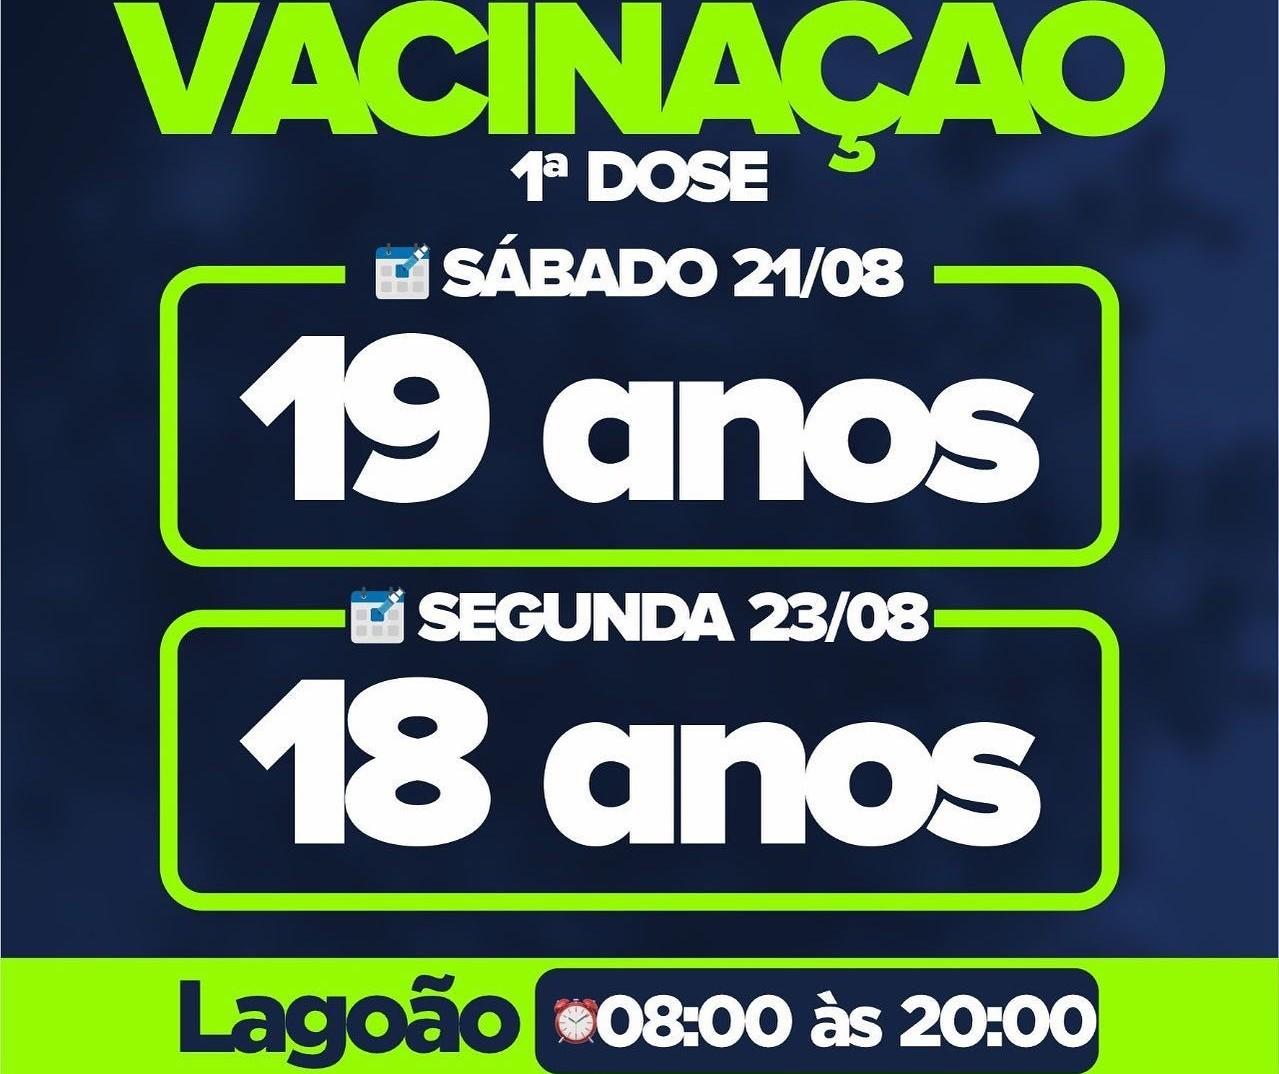 Apucarana vacina jovens de 18 anos na segunda-feira (23)